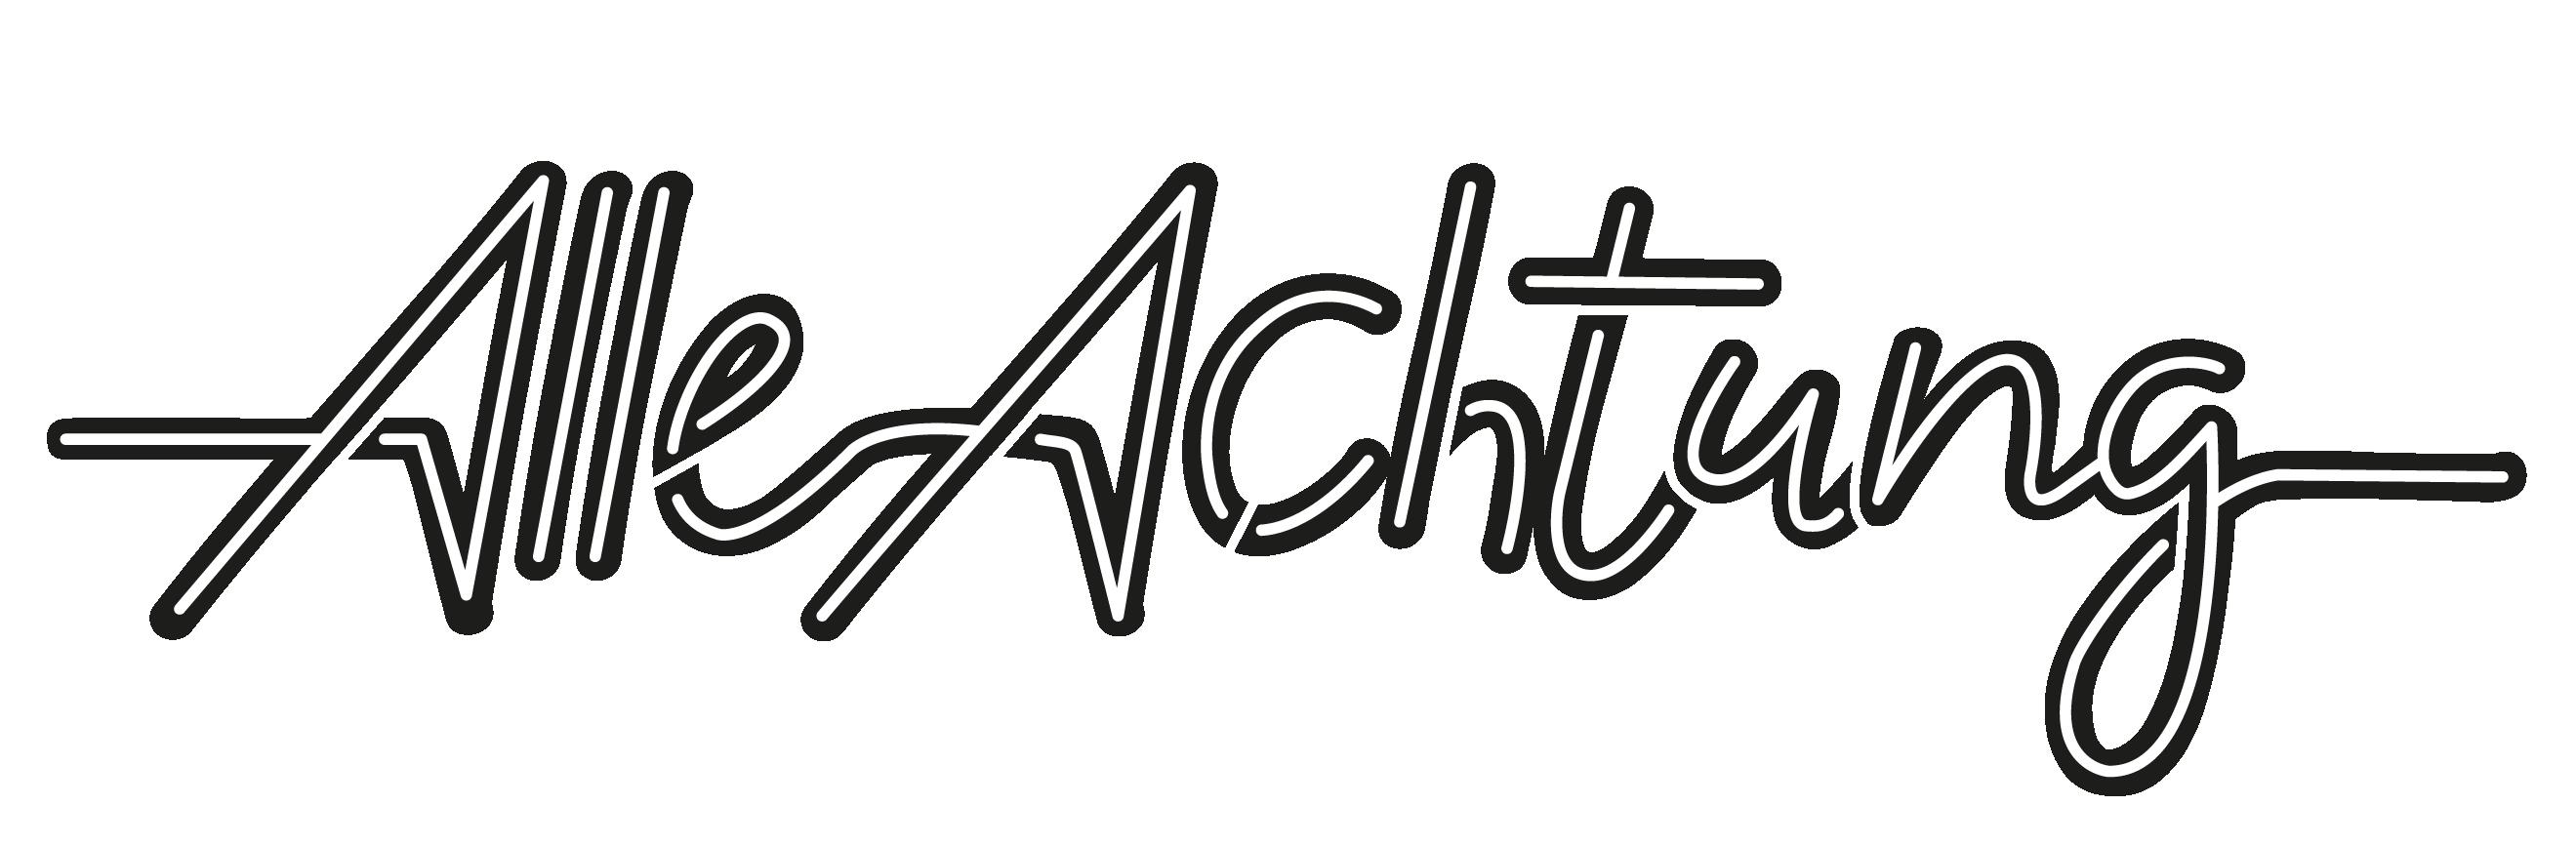 alle achtung logo